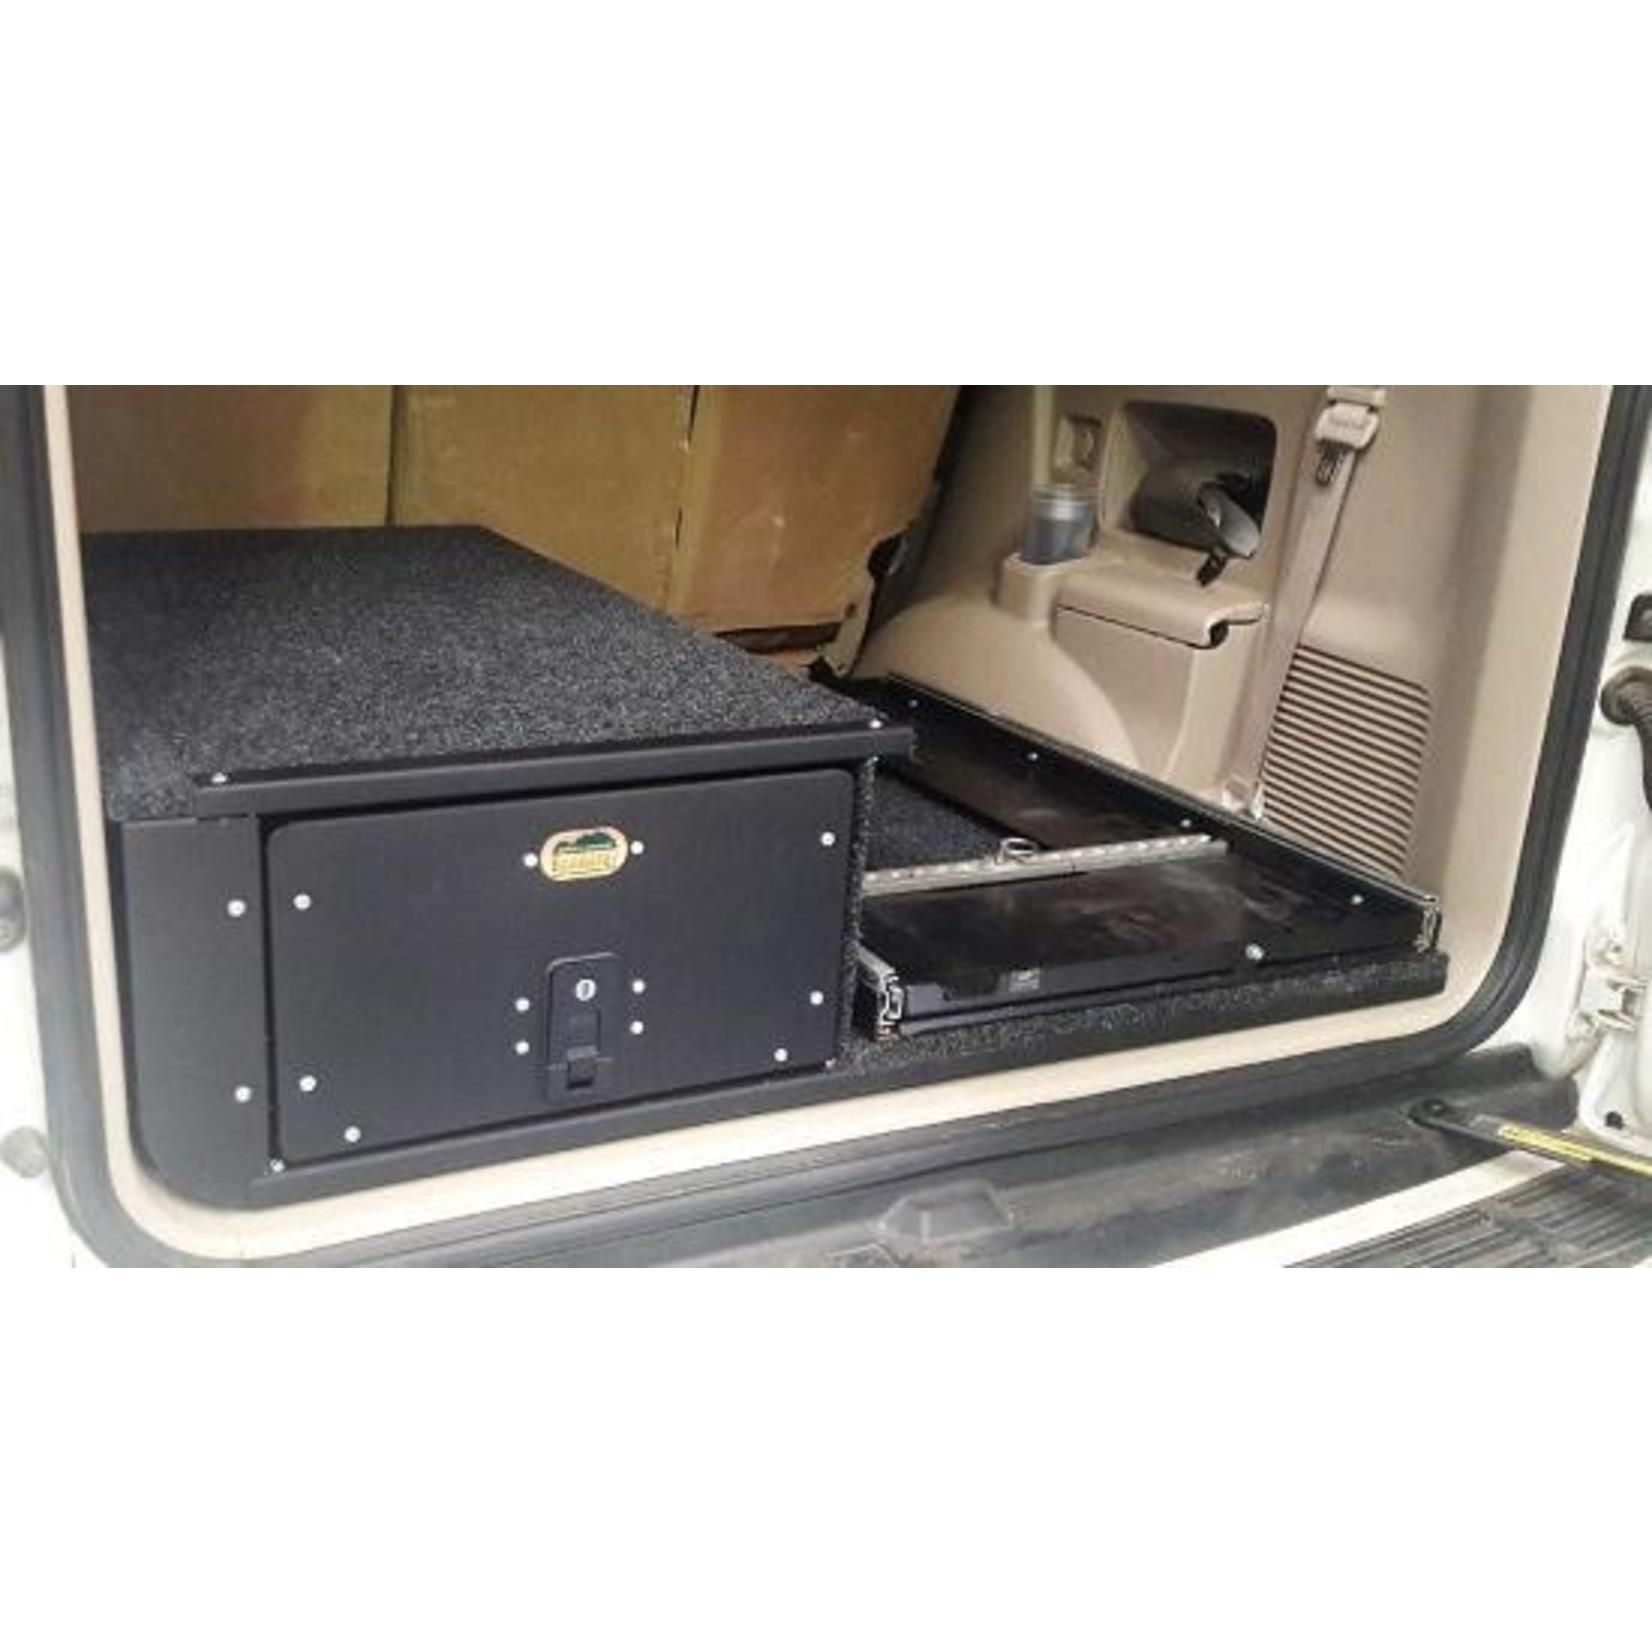 Big Country 4x4 Big Country 4x4 Toyota Prado 120/Lexus GX 470 Single Drawer Kit w/Fridge Platform